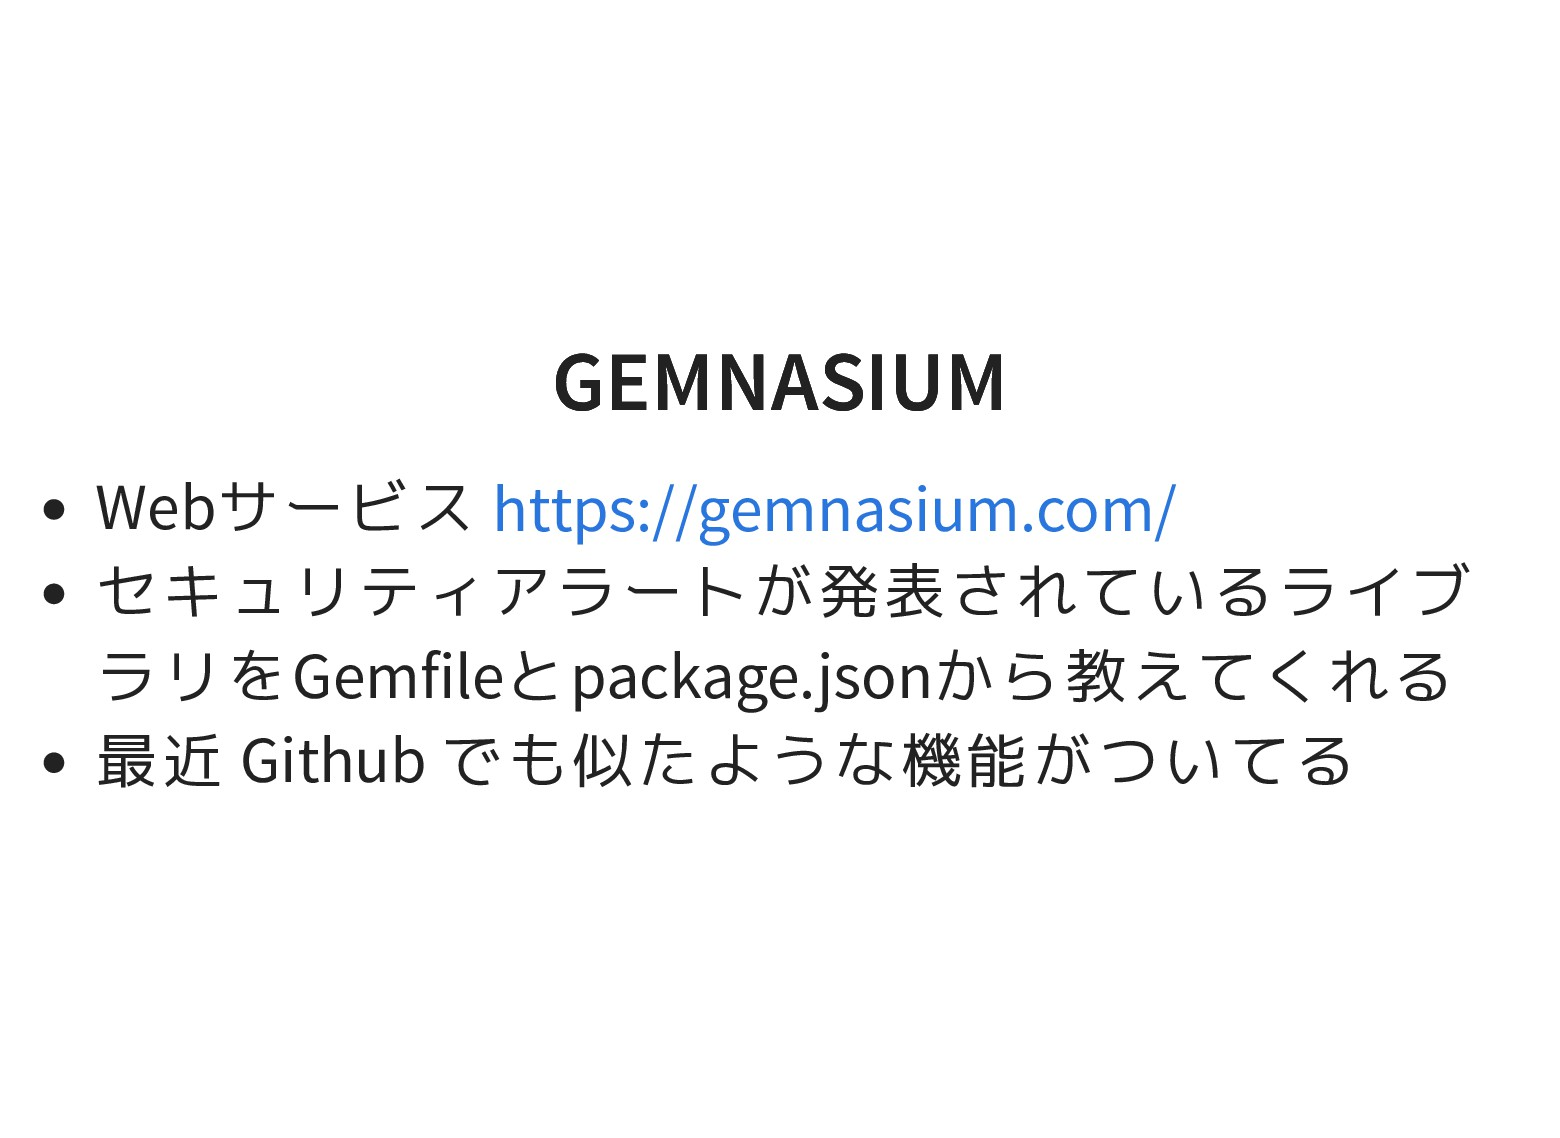 GEMNASIUM GEMNASIUM Webサービス セキュリティアラートが発表されているラ...